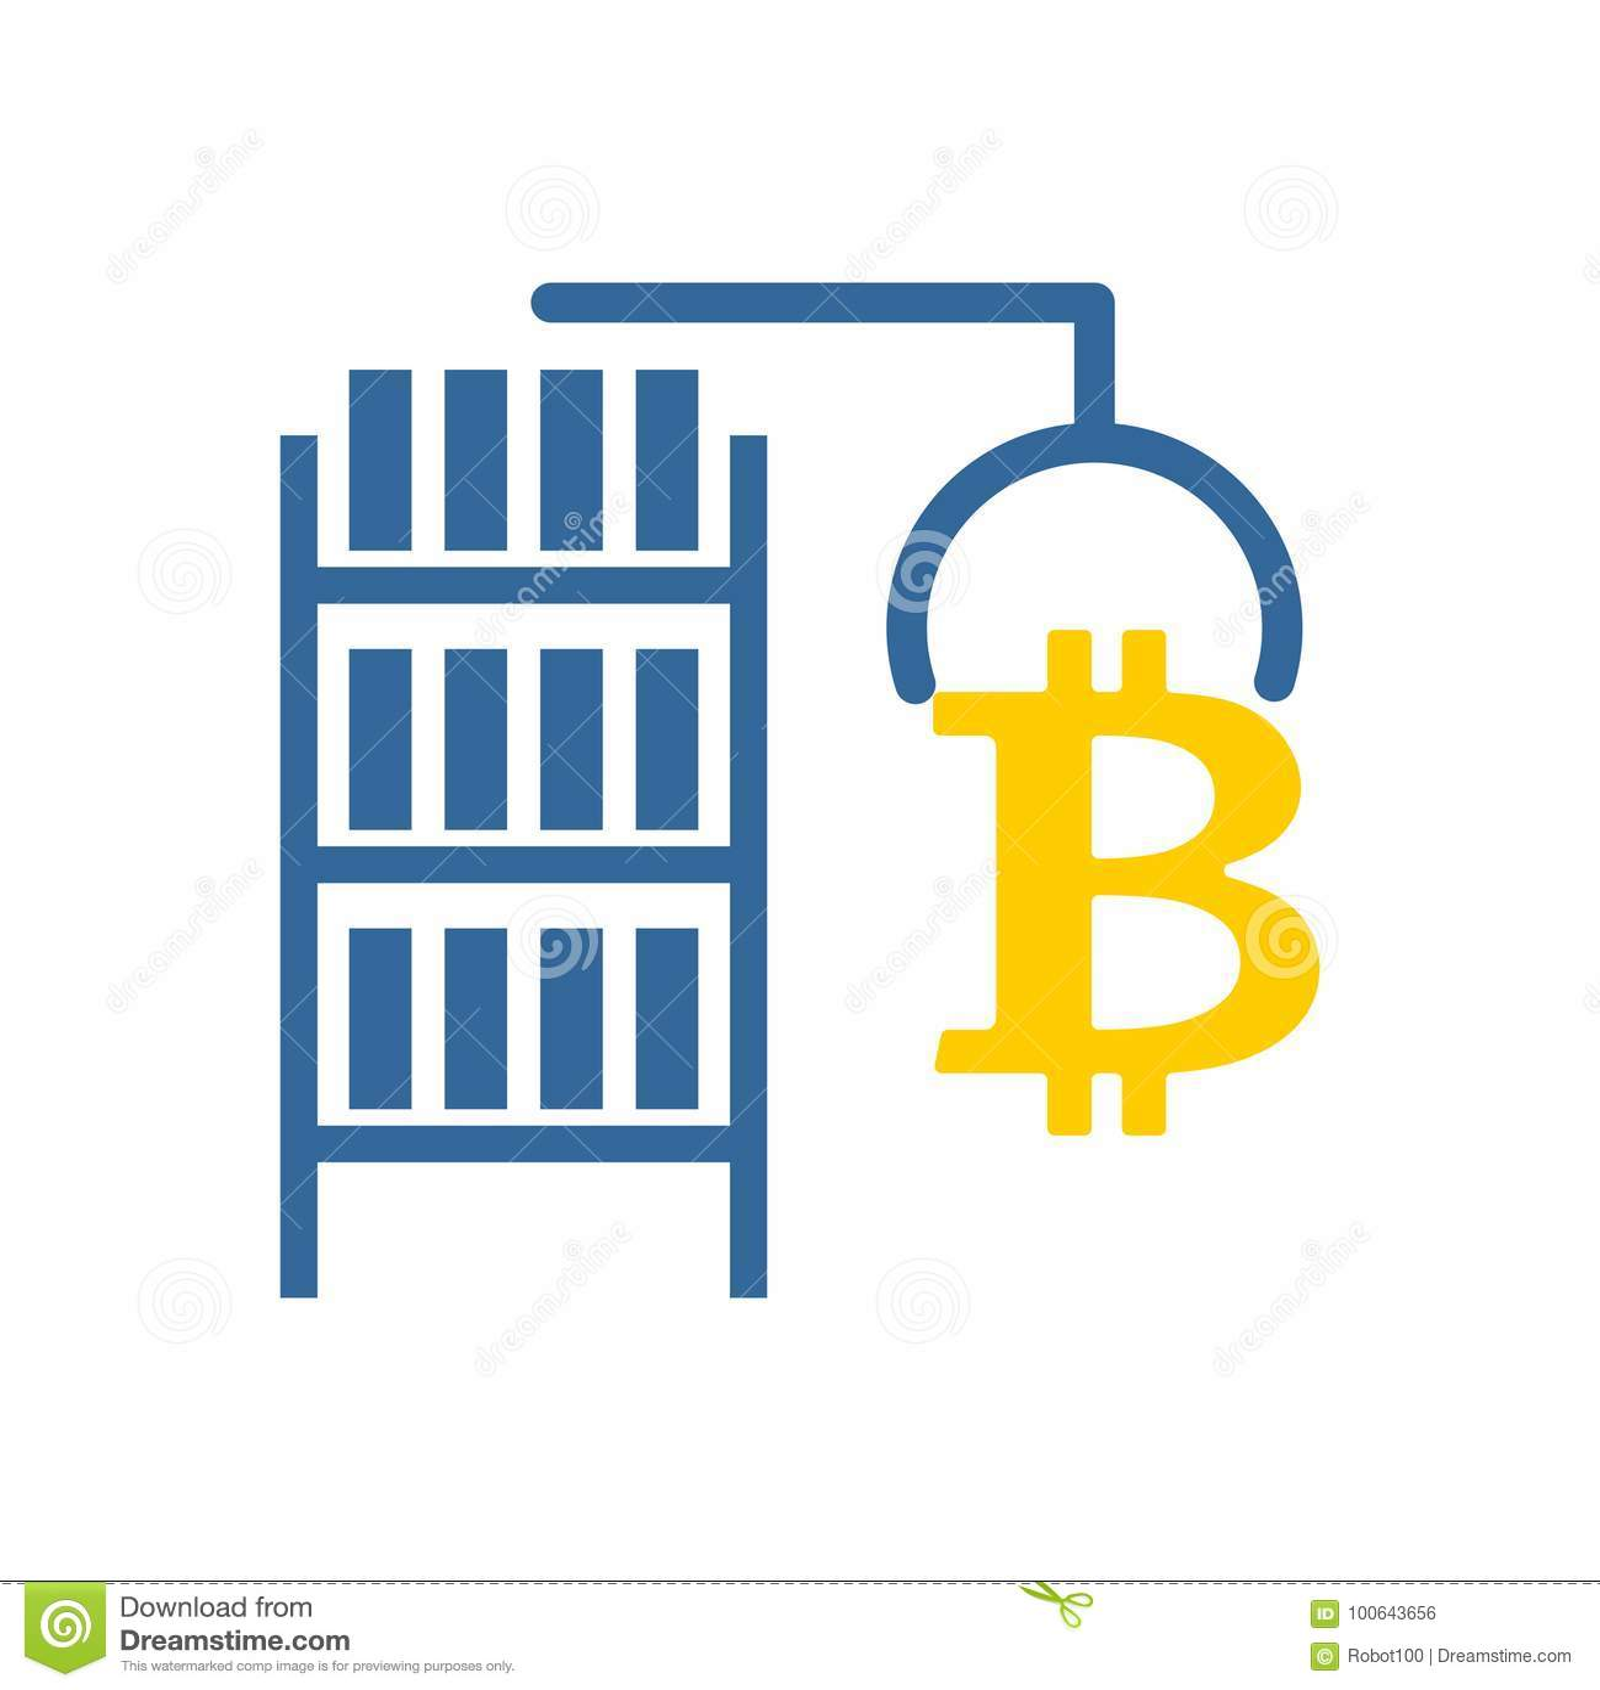 Troy trade kryptowährung